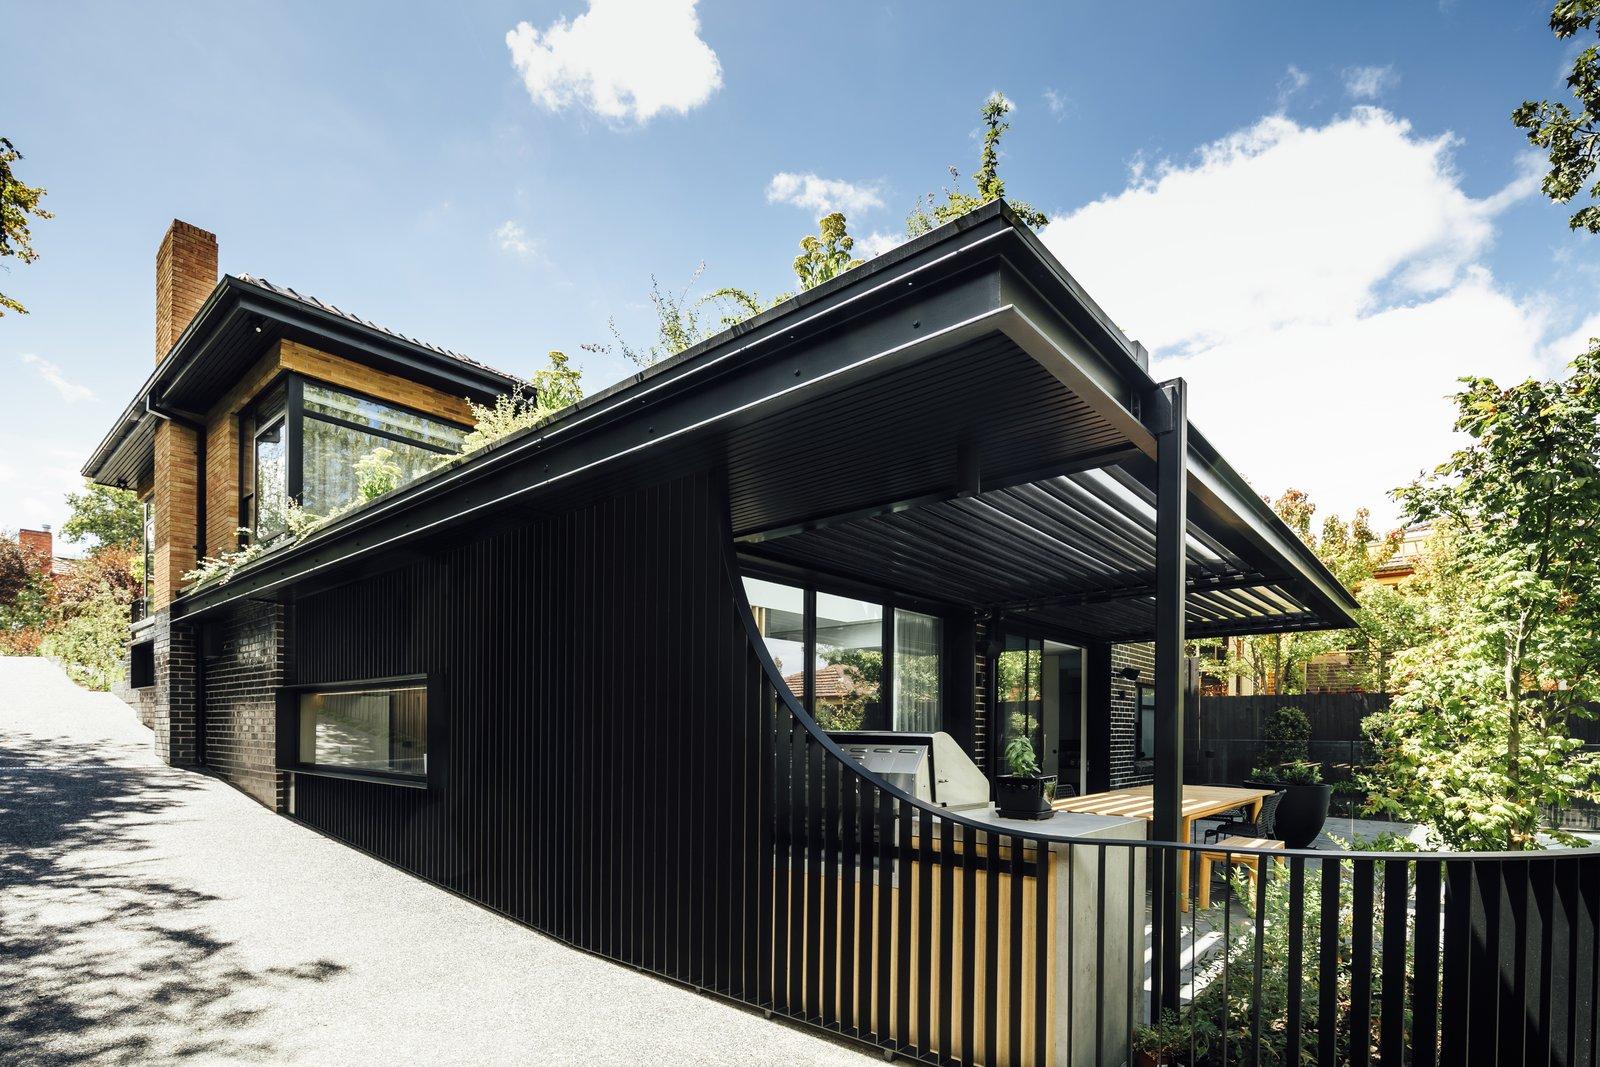 Triple Fronted Revival steel facade